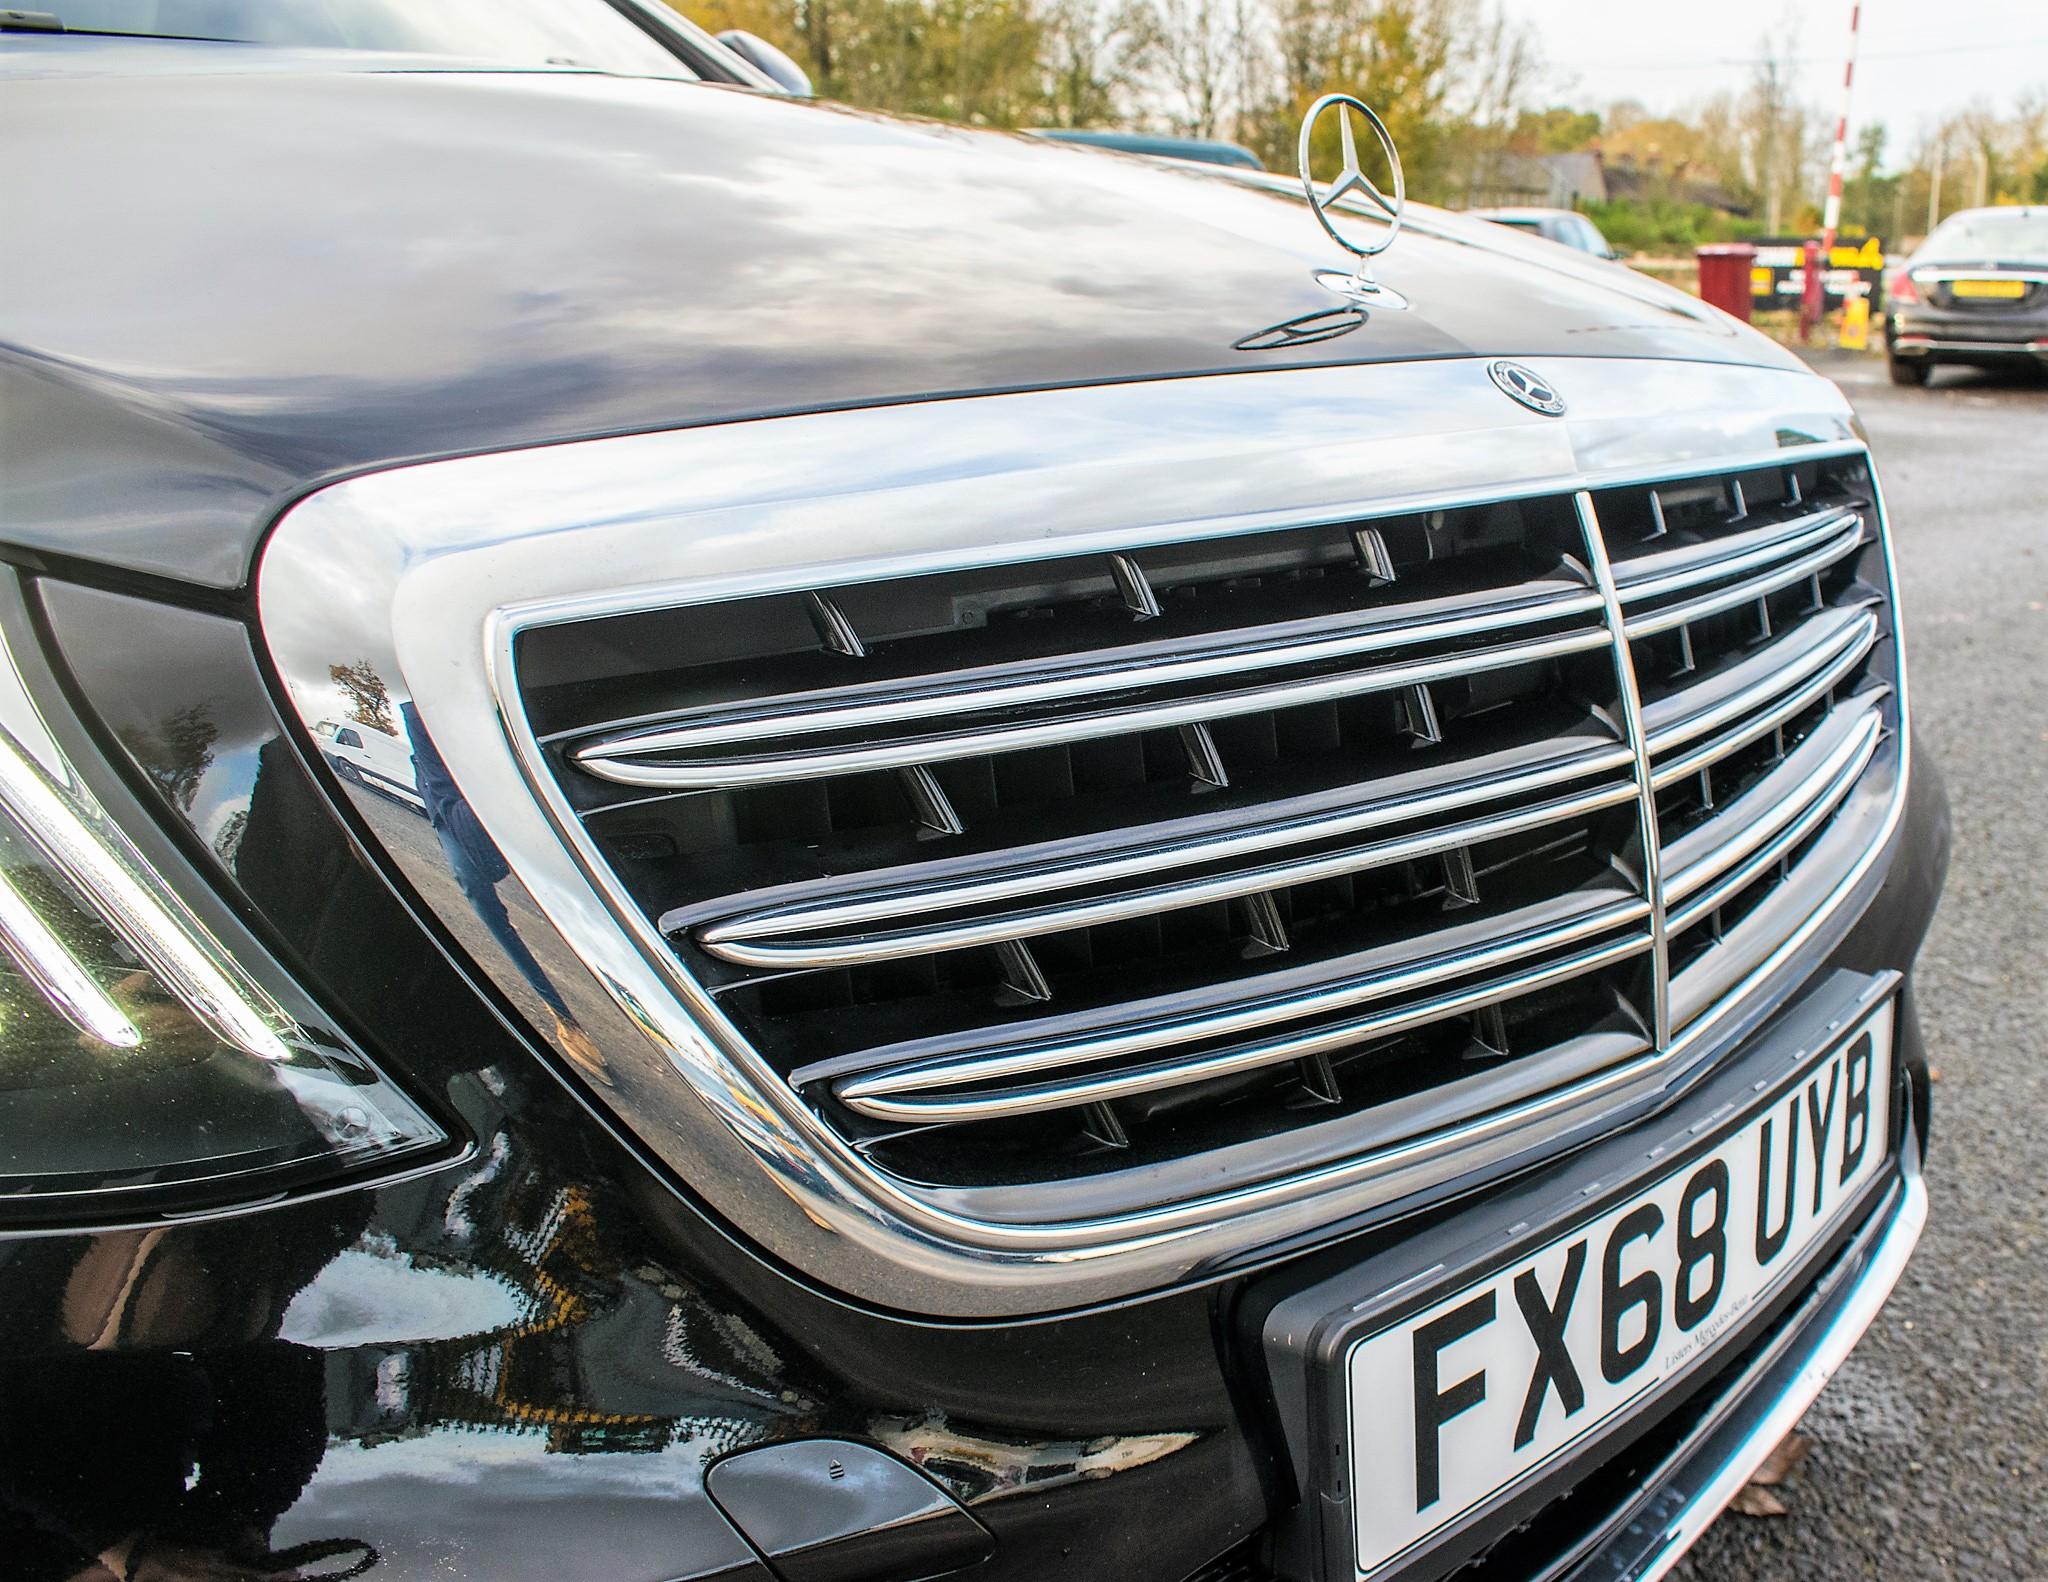 Mercedes Benz S450 L AMG Line Executive auto petrol 4 door saloon car Registration Number: FX68 - Image 17 of 33